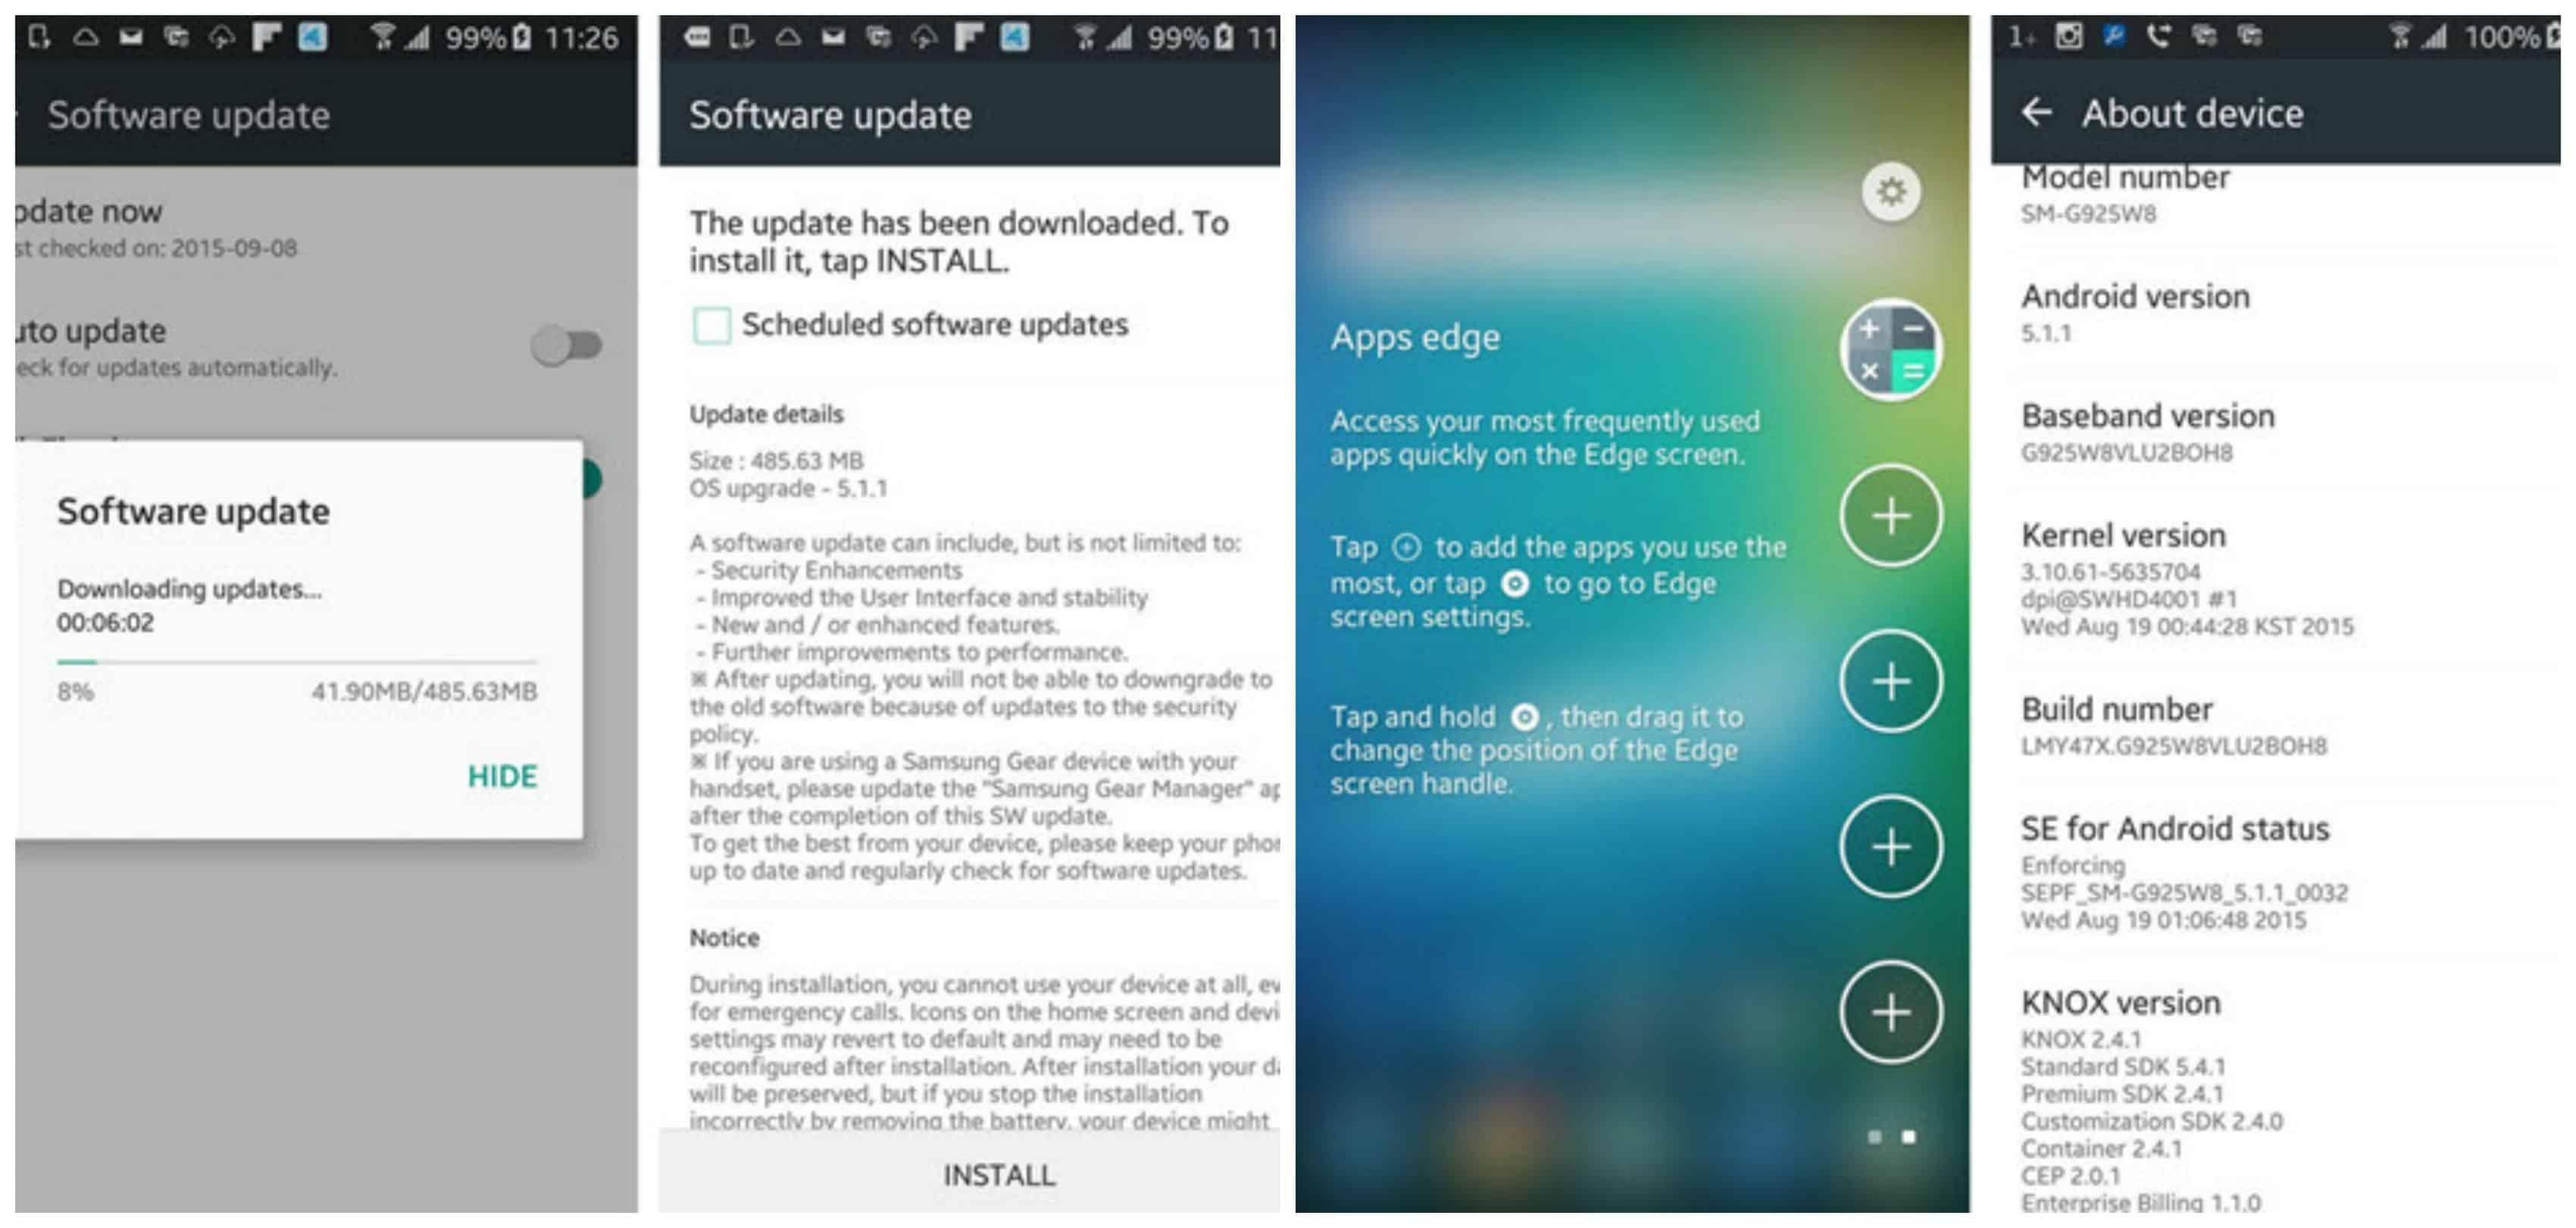 Telus Galaxy S6 Edge getting 5.1.1 upgrade Main